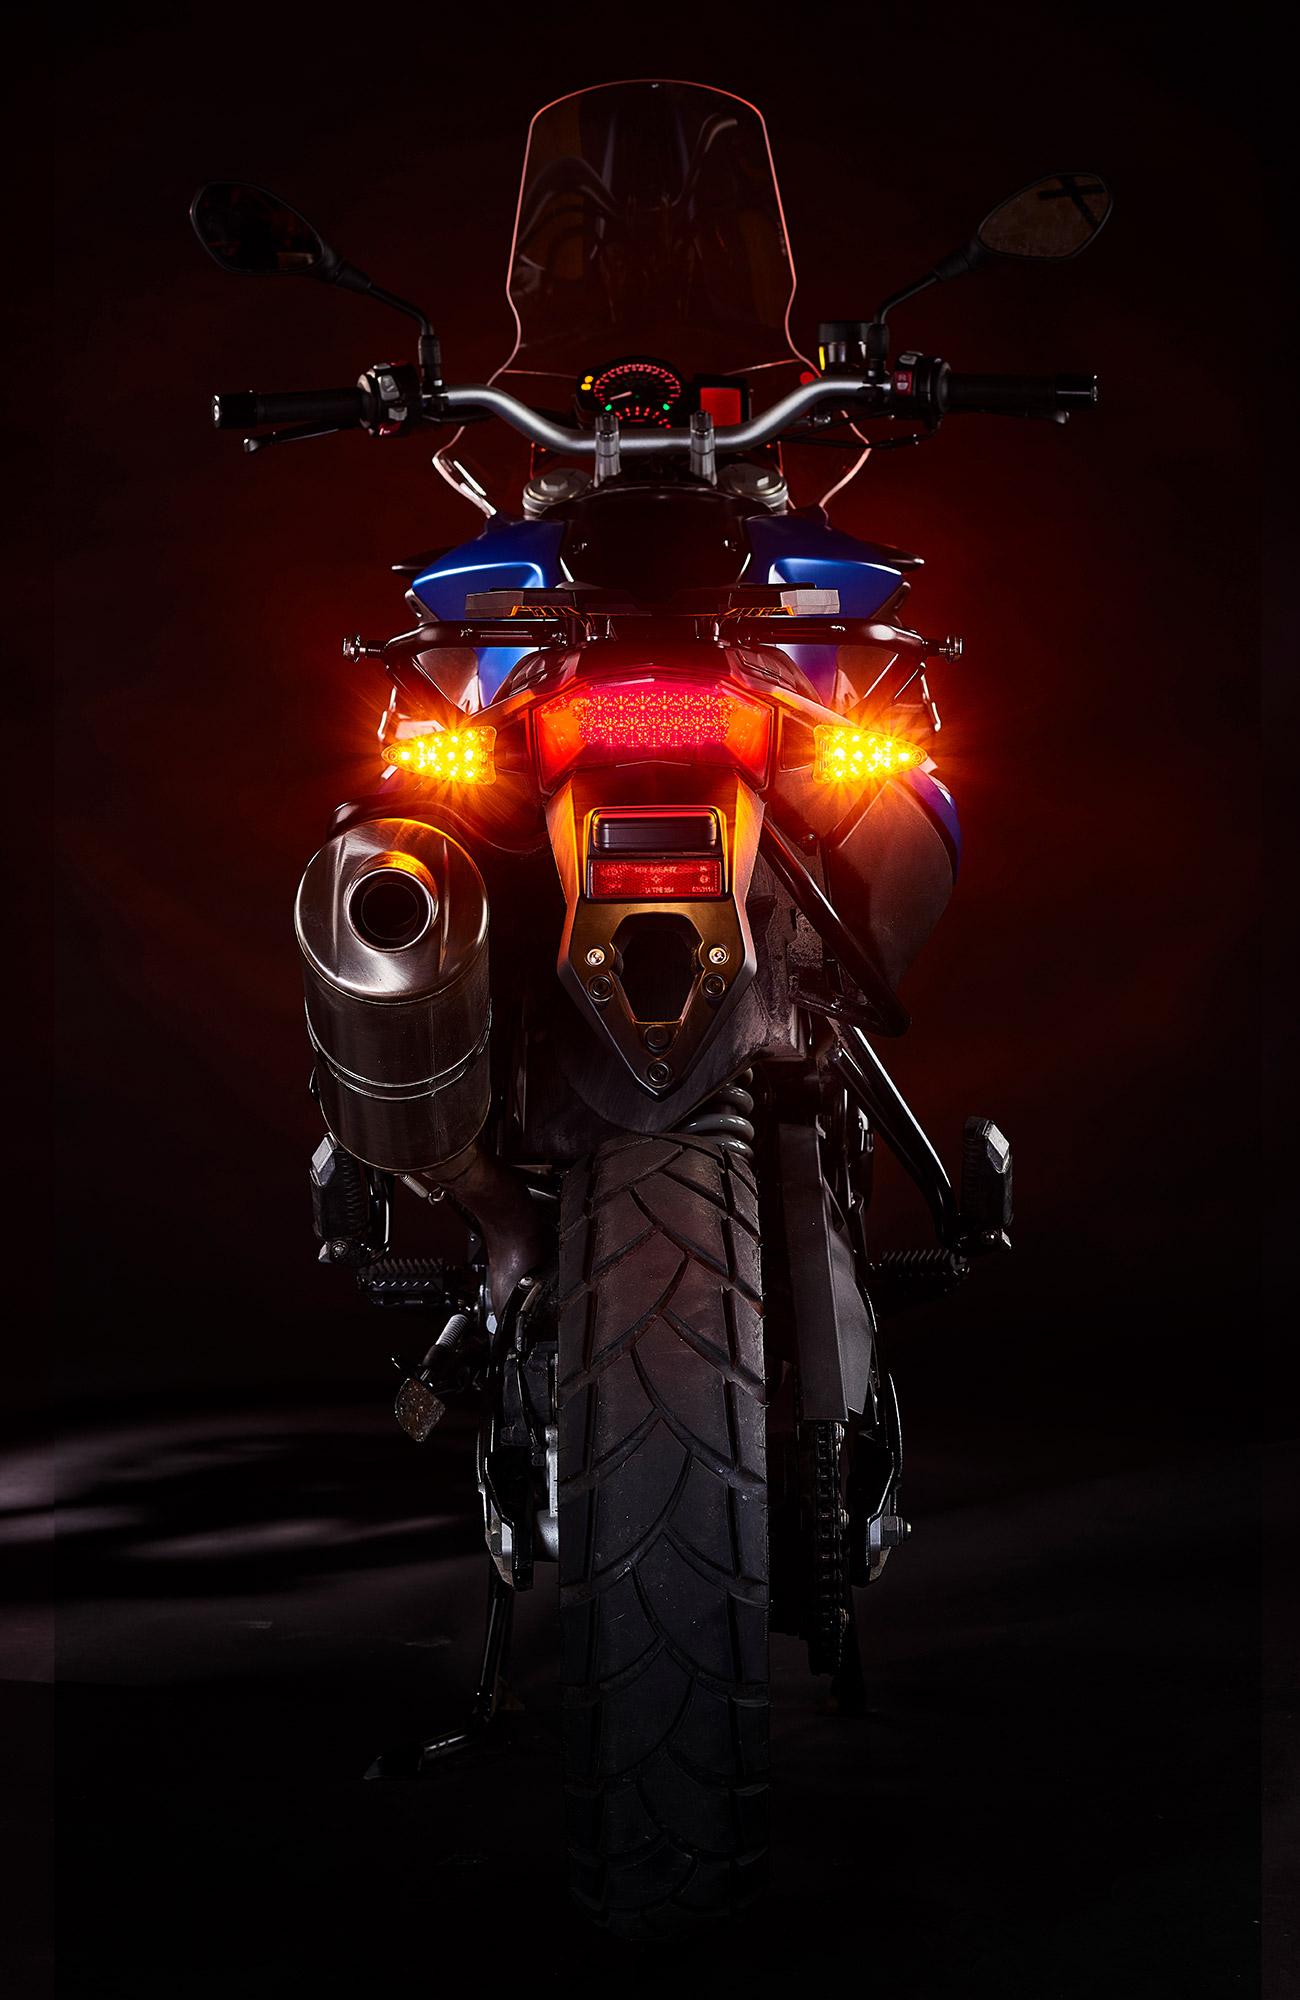 2-in-1-ultrabrights-brake-turn-newBMWs-3 (web).jpg